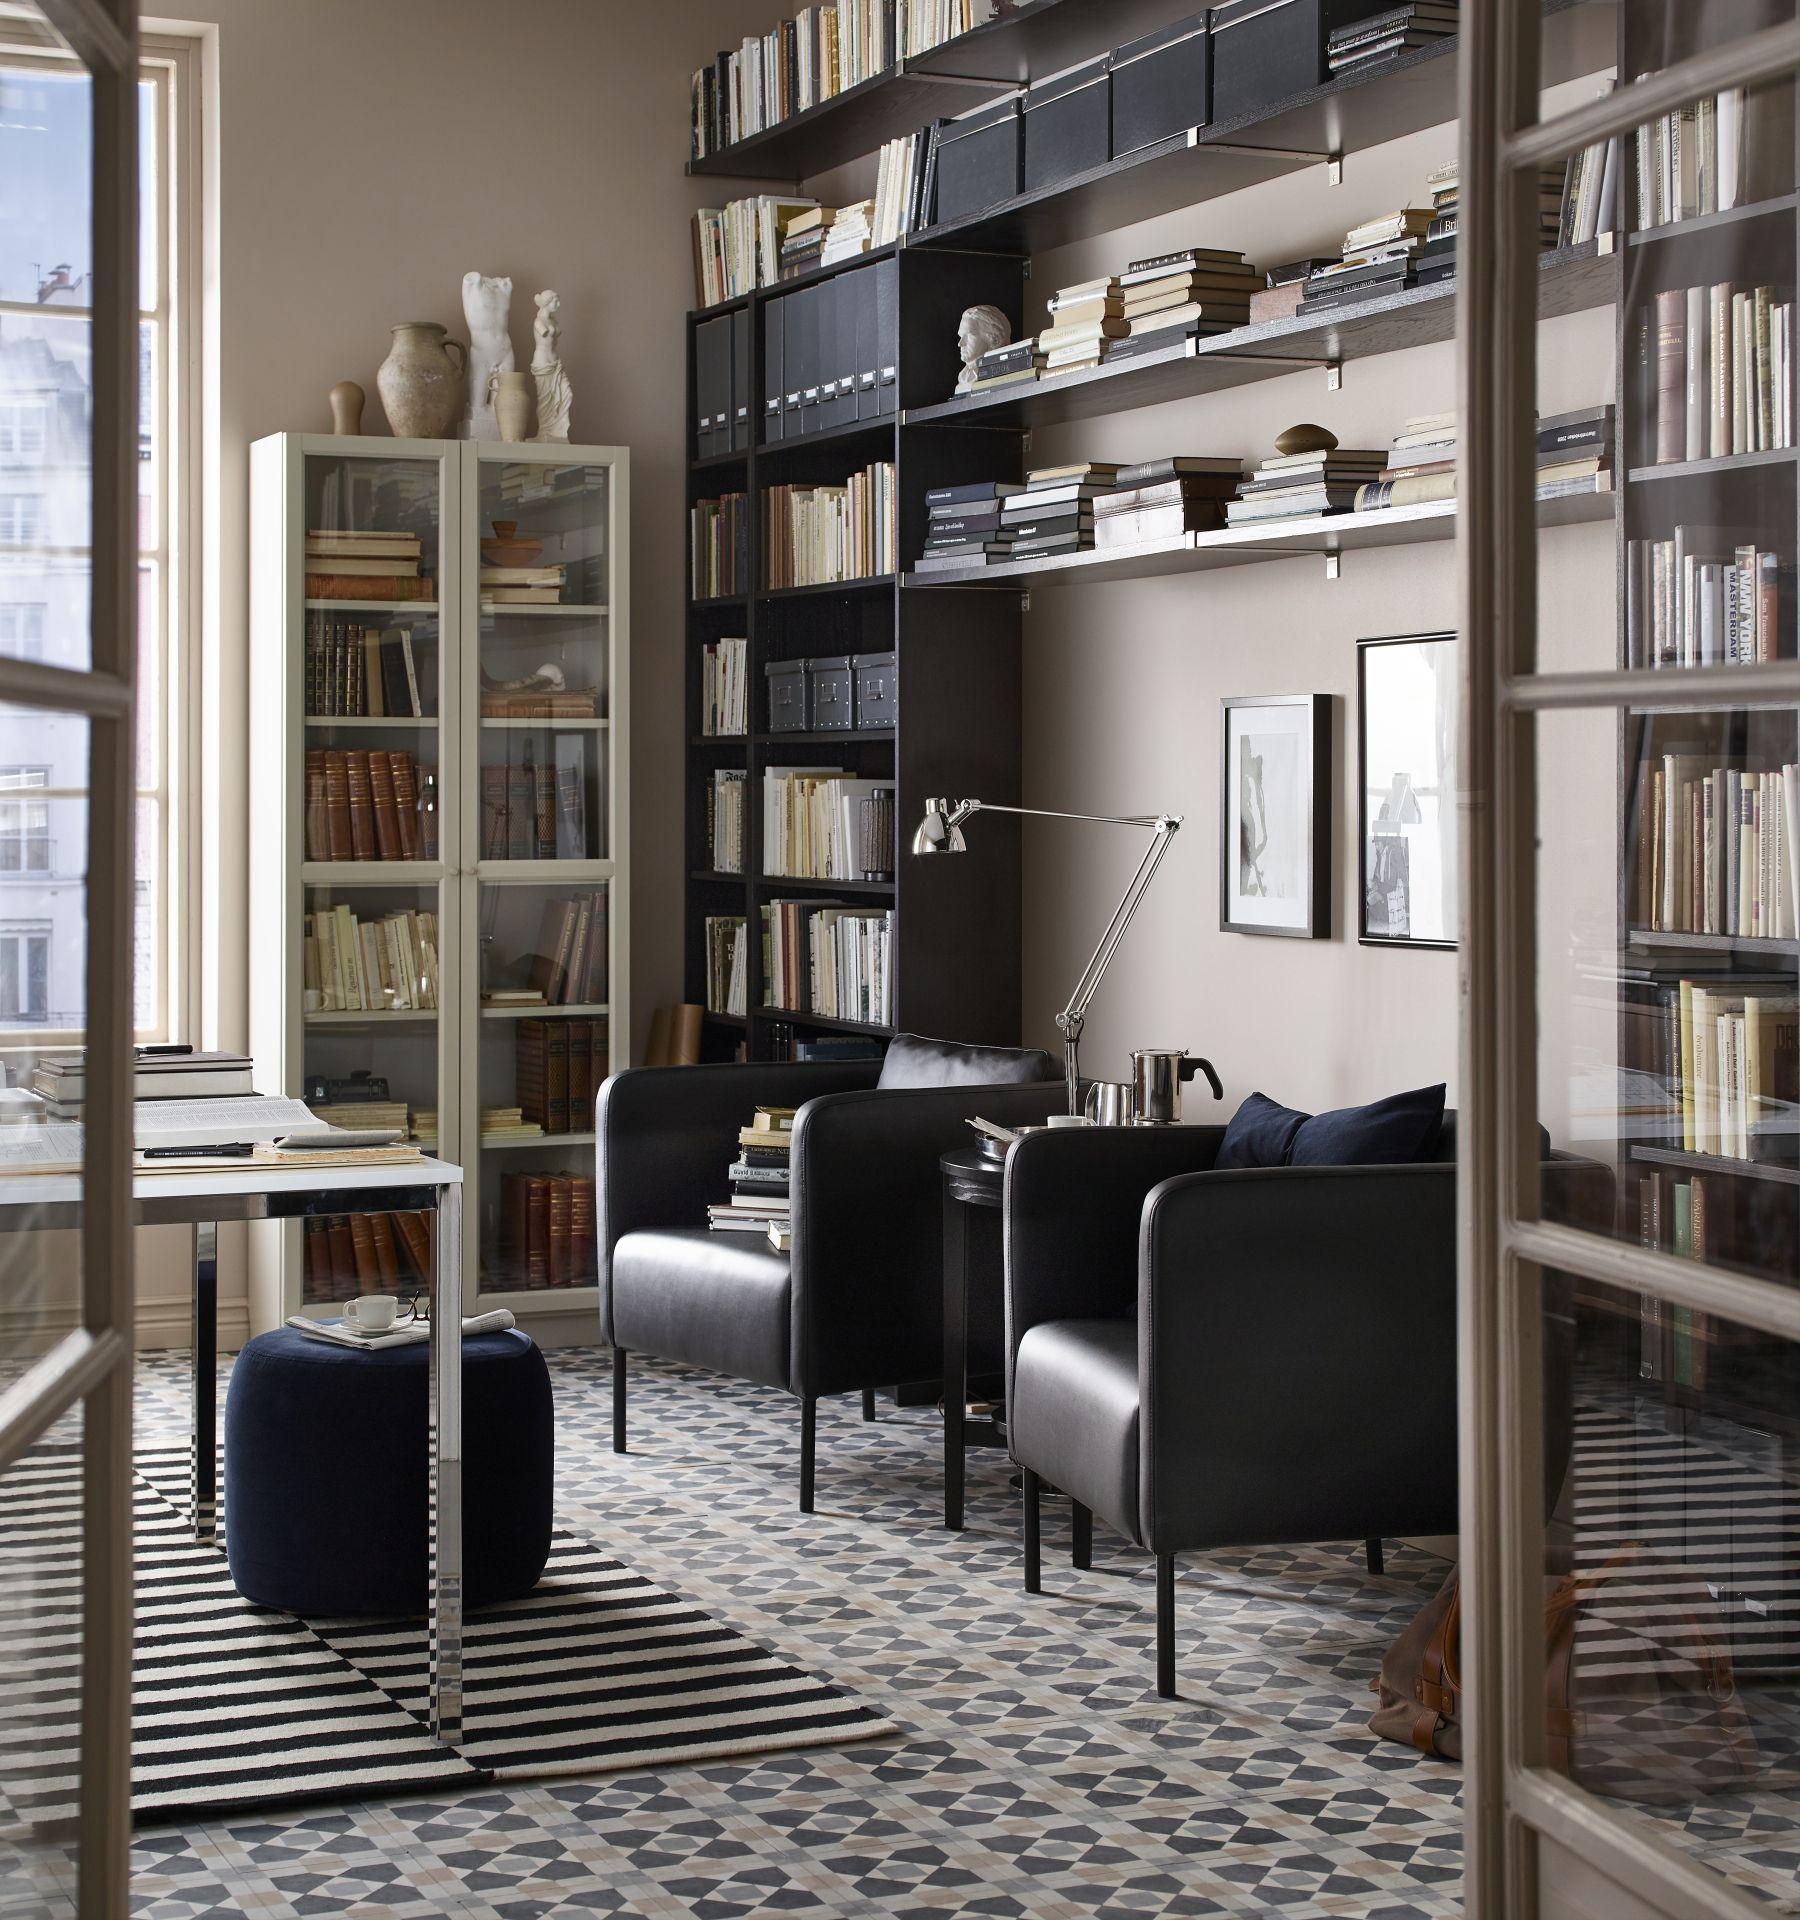 stockholm poef ikeacatalogus nieuw 2018 ikea ikeanl ikeanederland blauw donkerblauw poefje billy boekenkast kast deuren glas landskrona fauteuil stoel